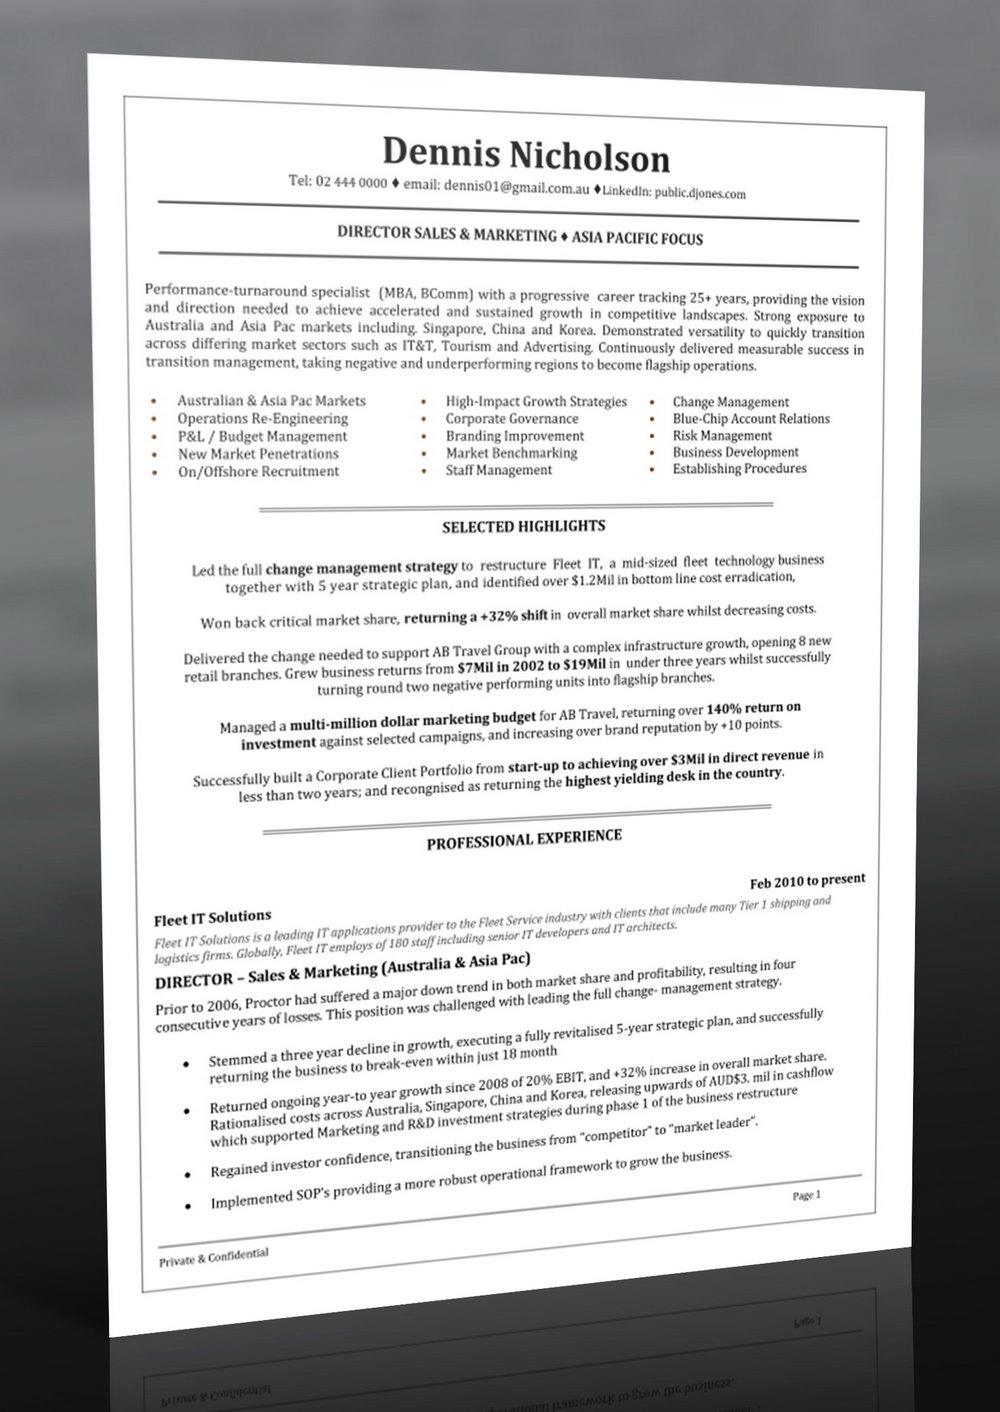 Professional Resume Writing Services Richmond Va